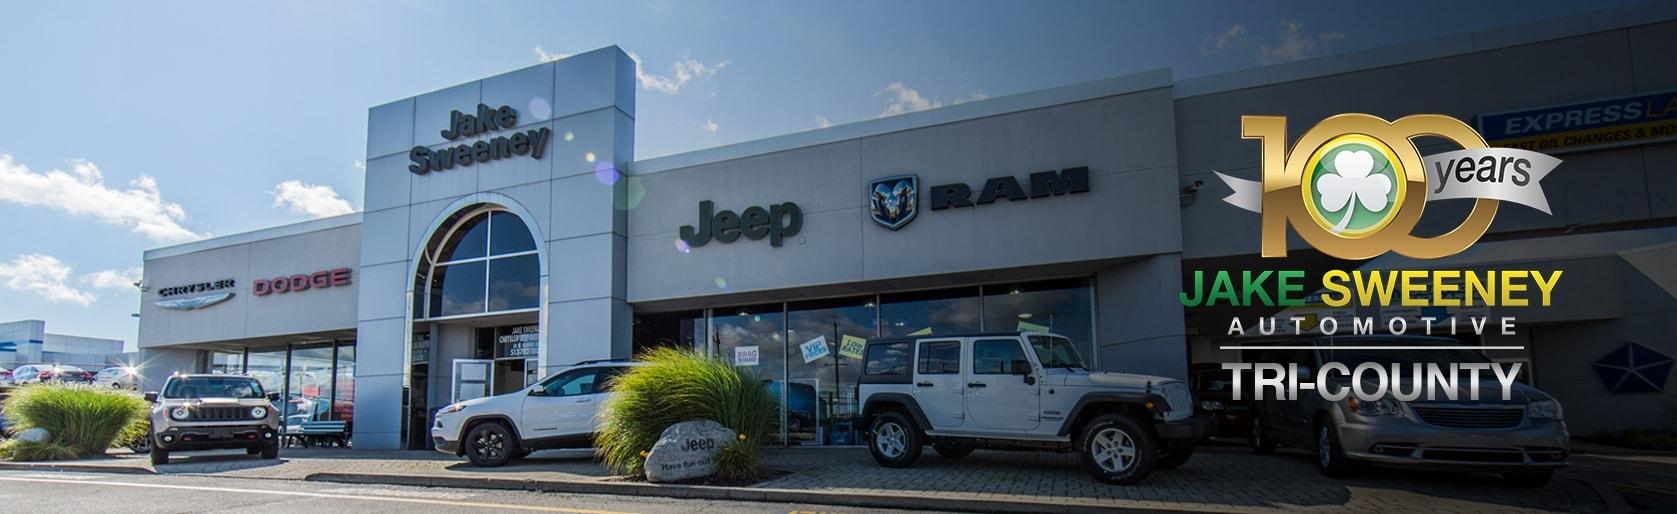 Jake Sweeney Jeep >> Jake Sweeney Automotive - New And Used Cars, Trucks, And ...